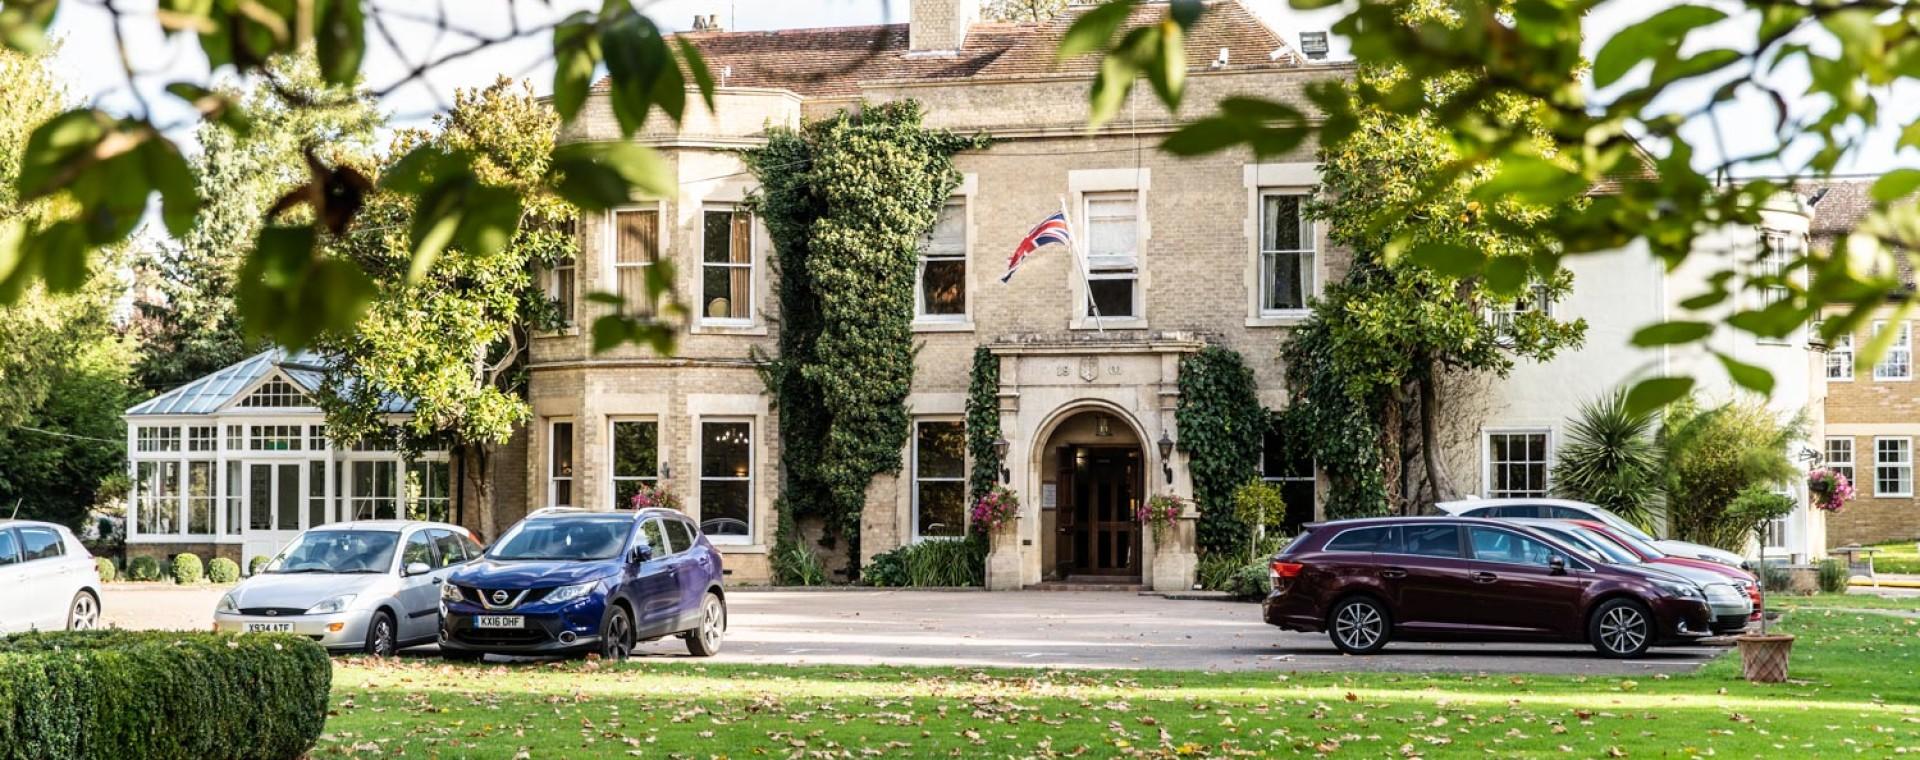 Woodland-Manor-Hotel-and-Restaurant-Grounds-09.jpg